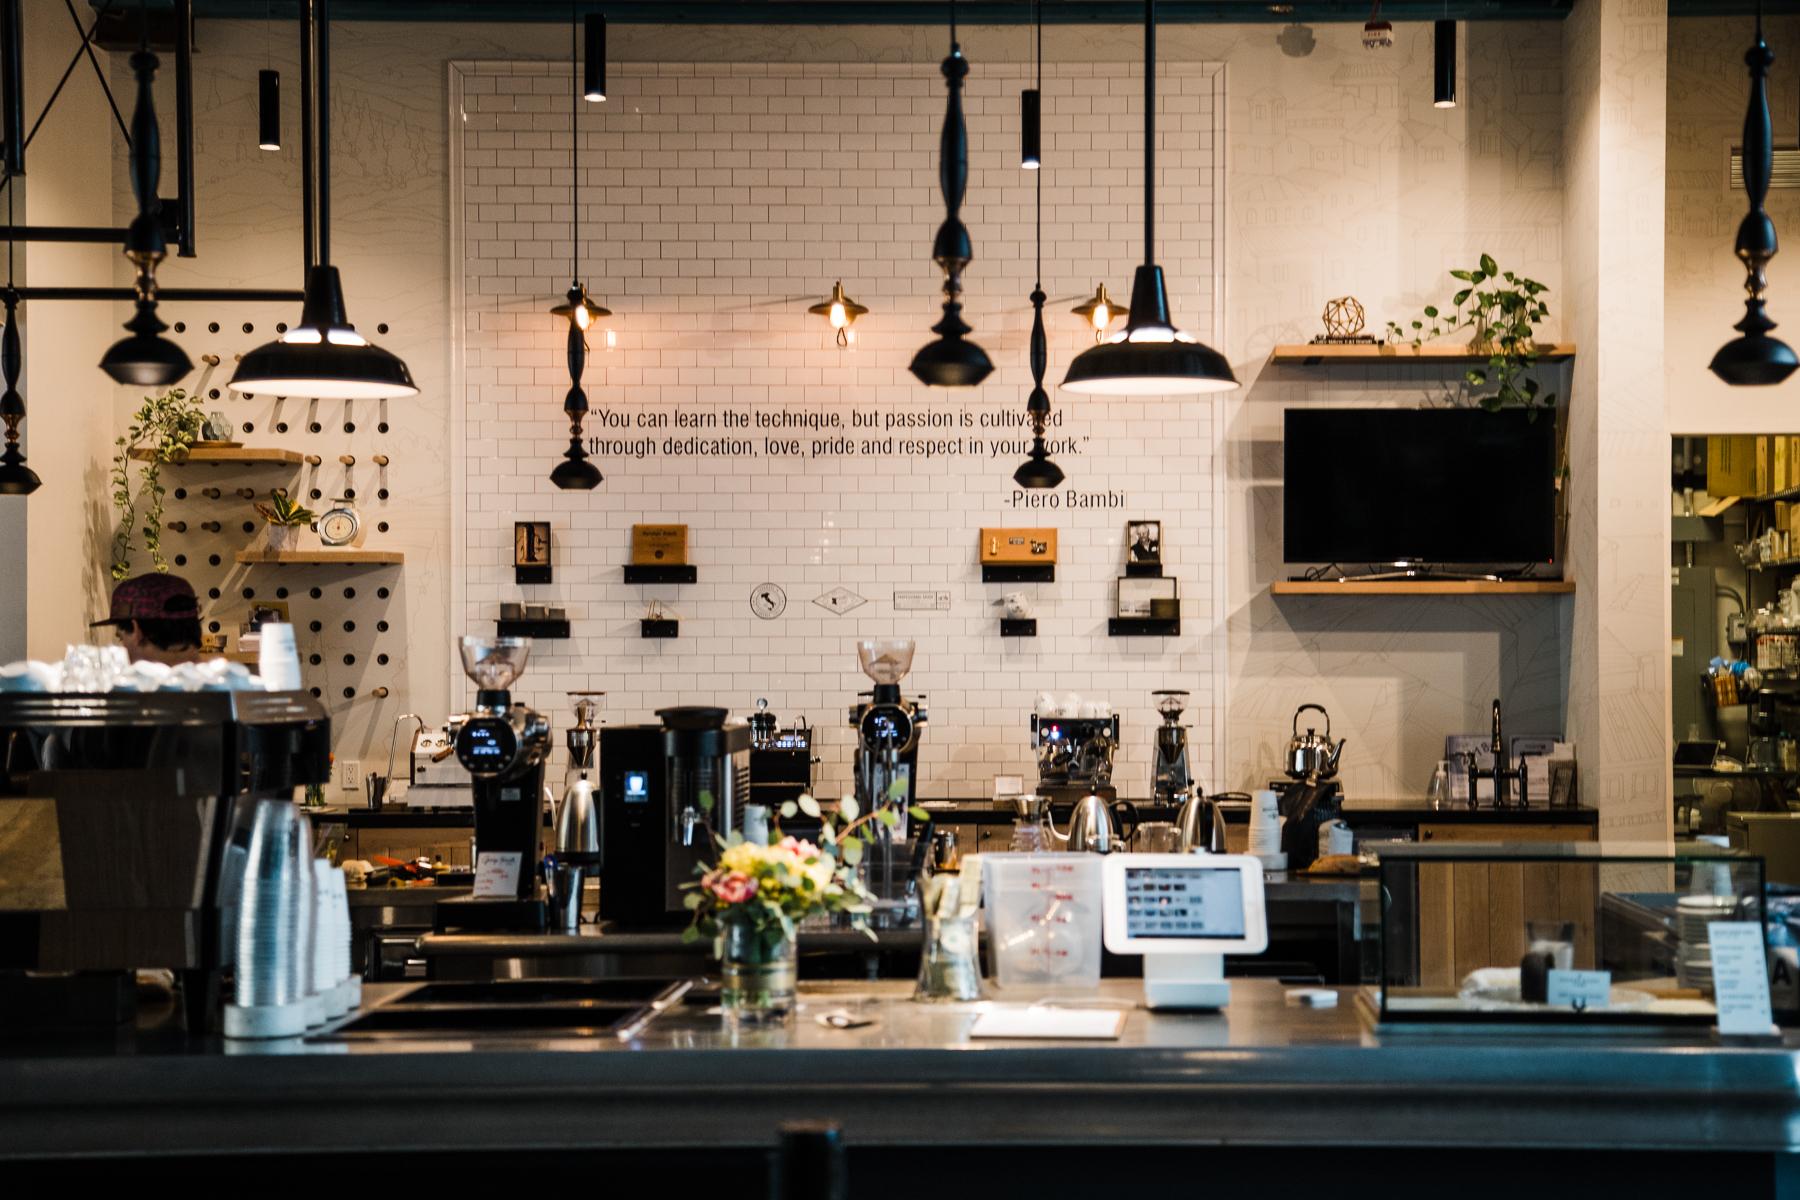 The espresso and brew bar at the La Marzocco Cafe in Seattle, Washington.